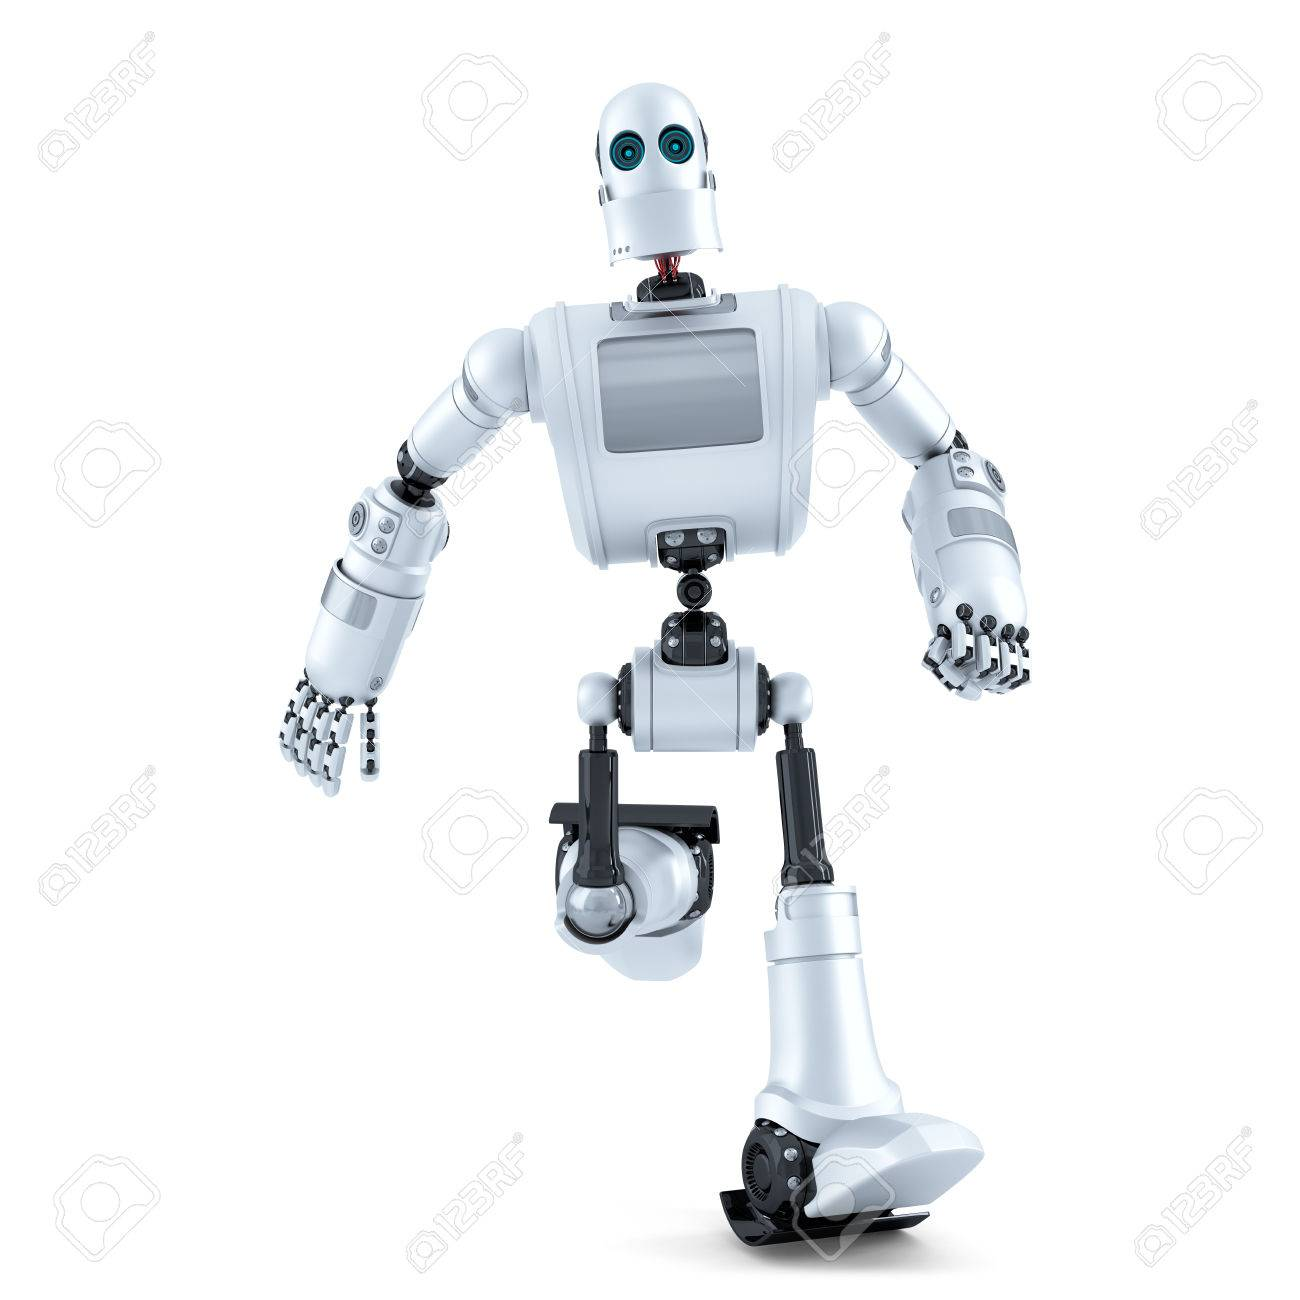 Running robot. Isolated on white. - 40577667